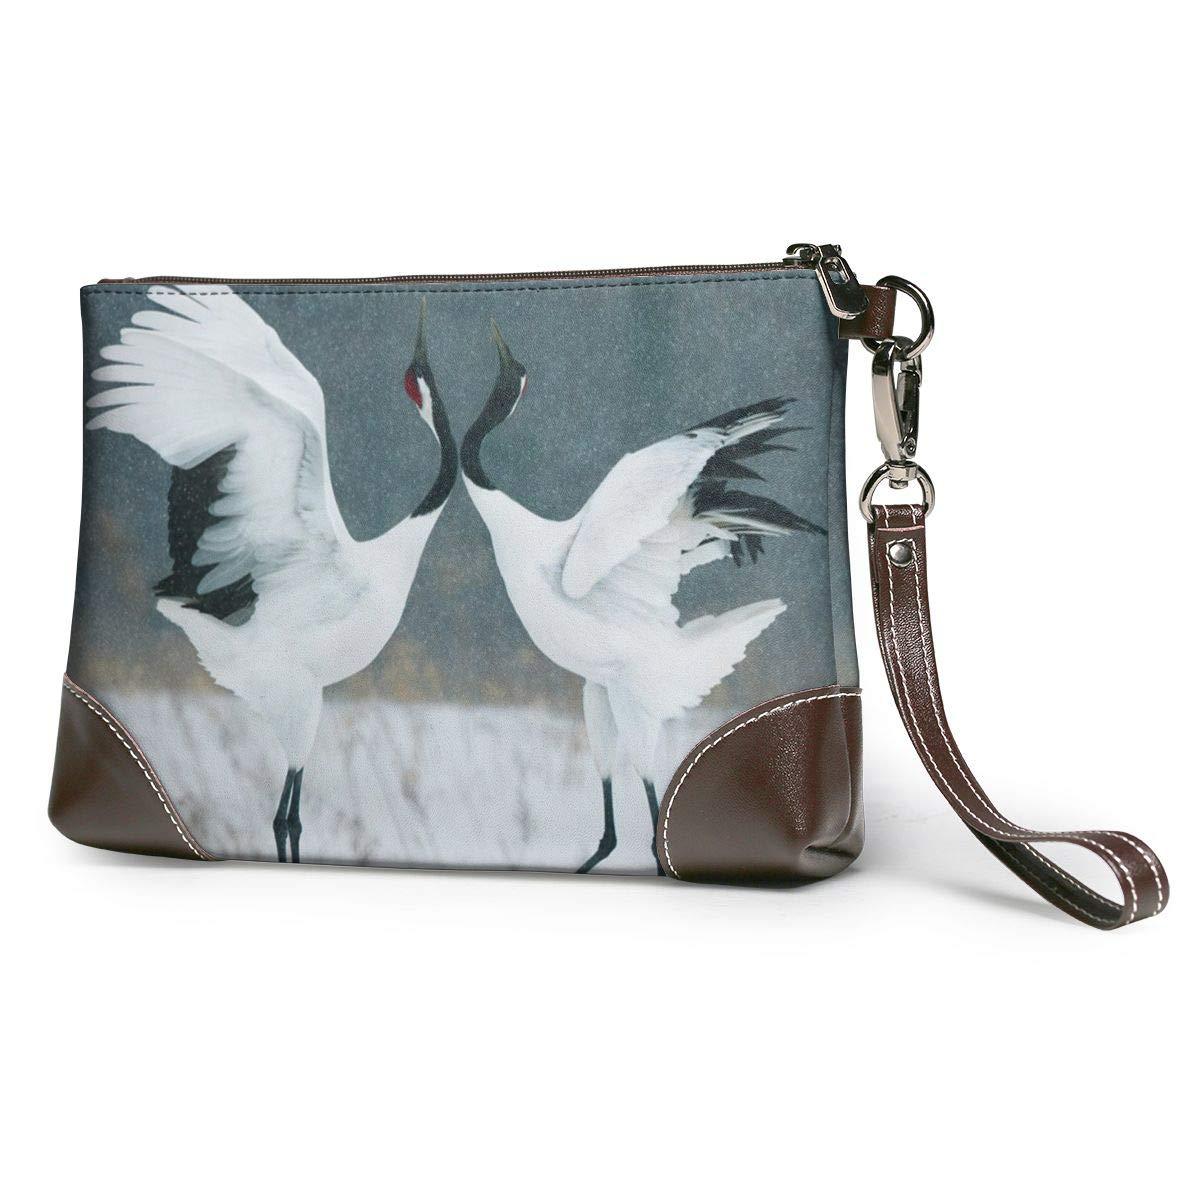 Songhe 6 Canvas Makeup Bag Pouch Purse Handbag Organizer with Zipper